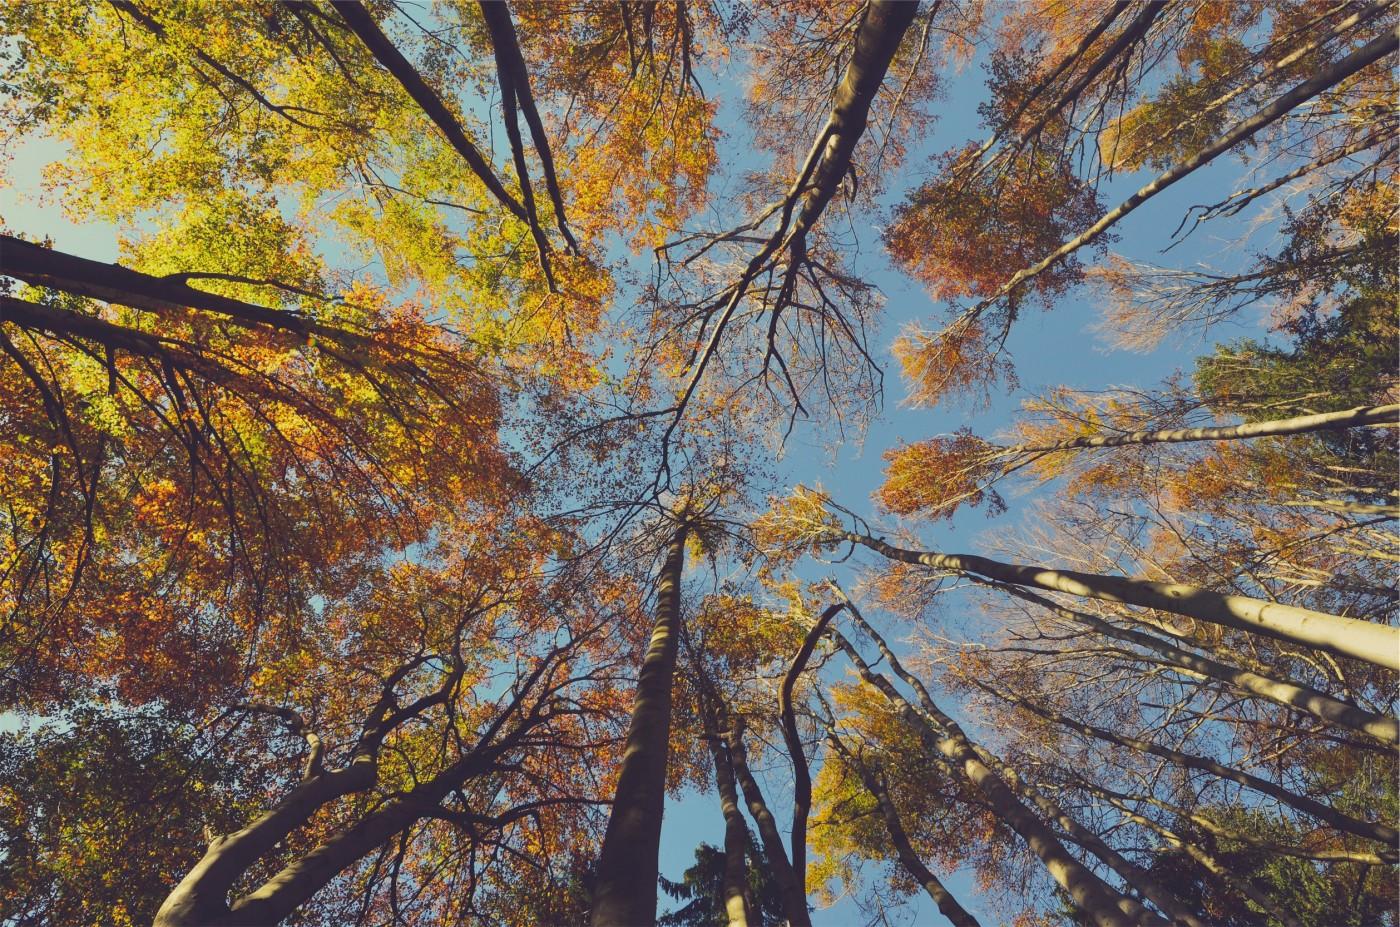 podas aema en otoño